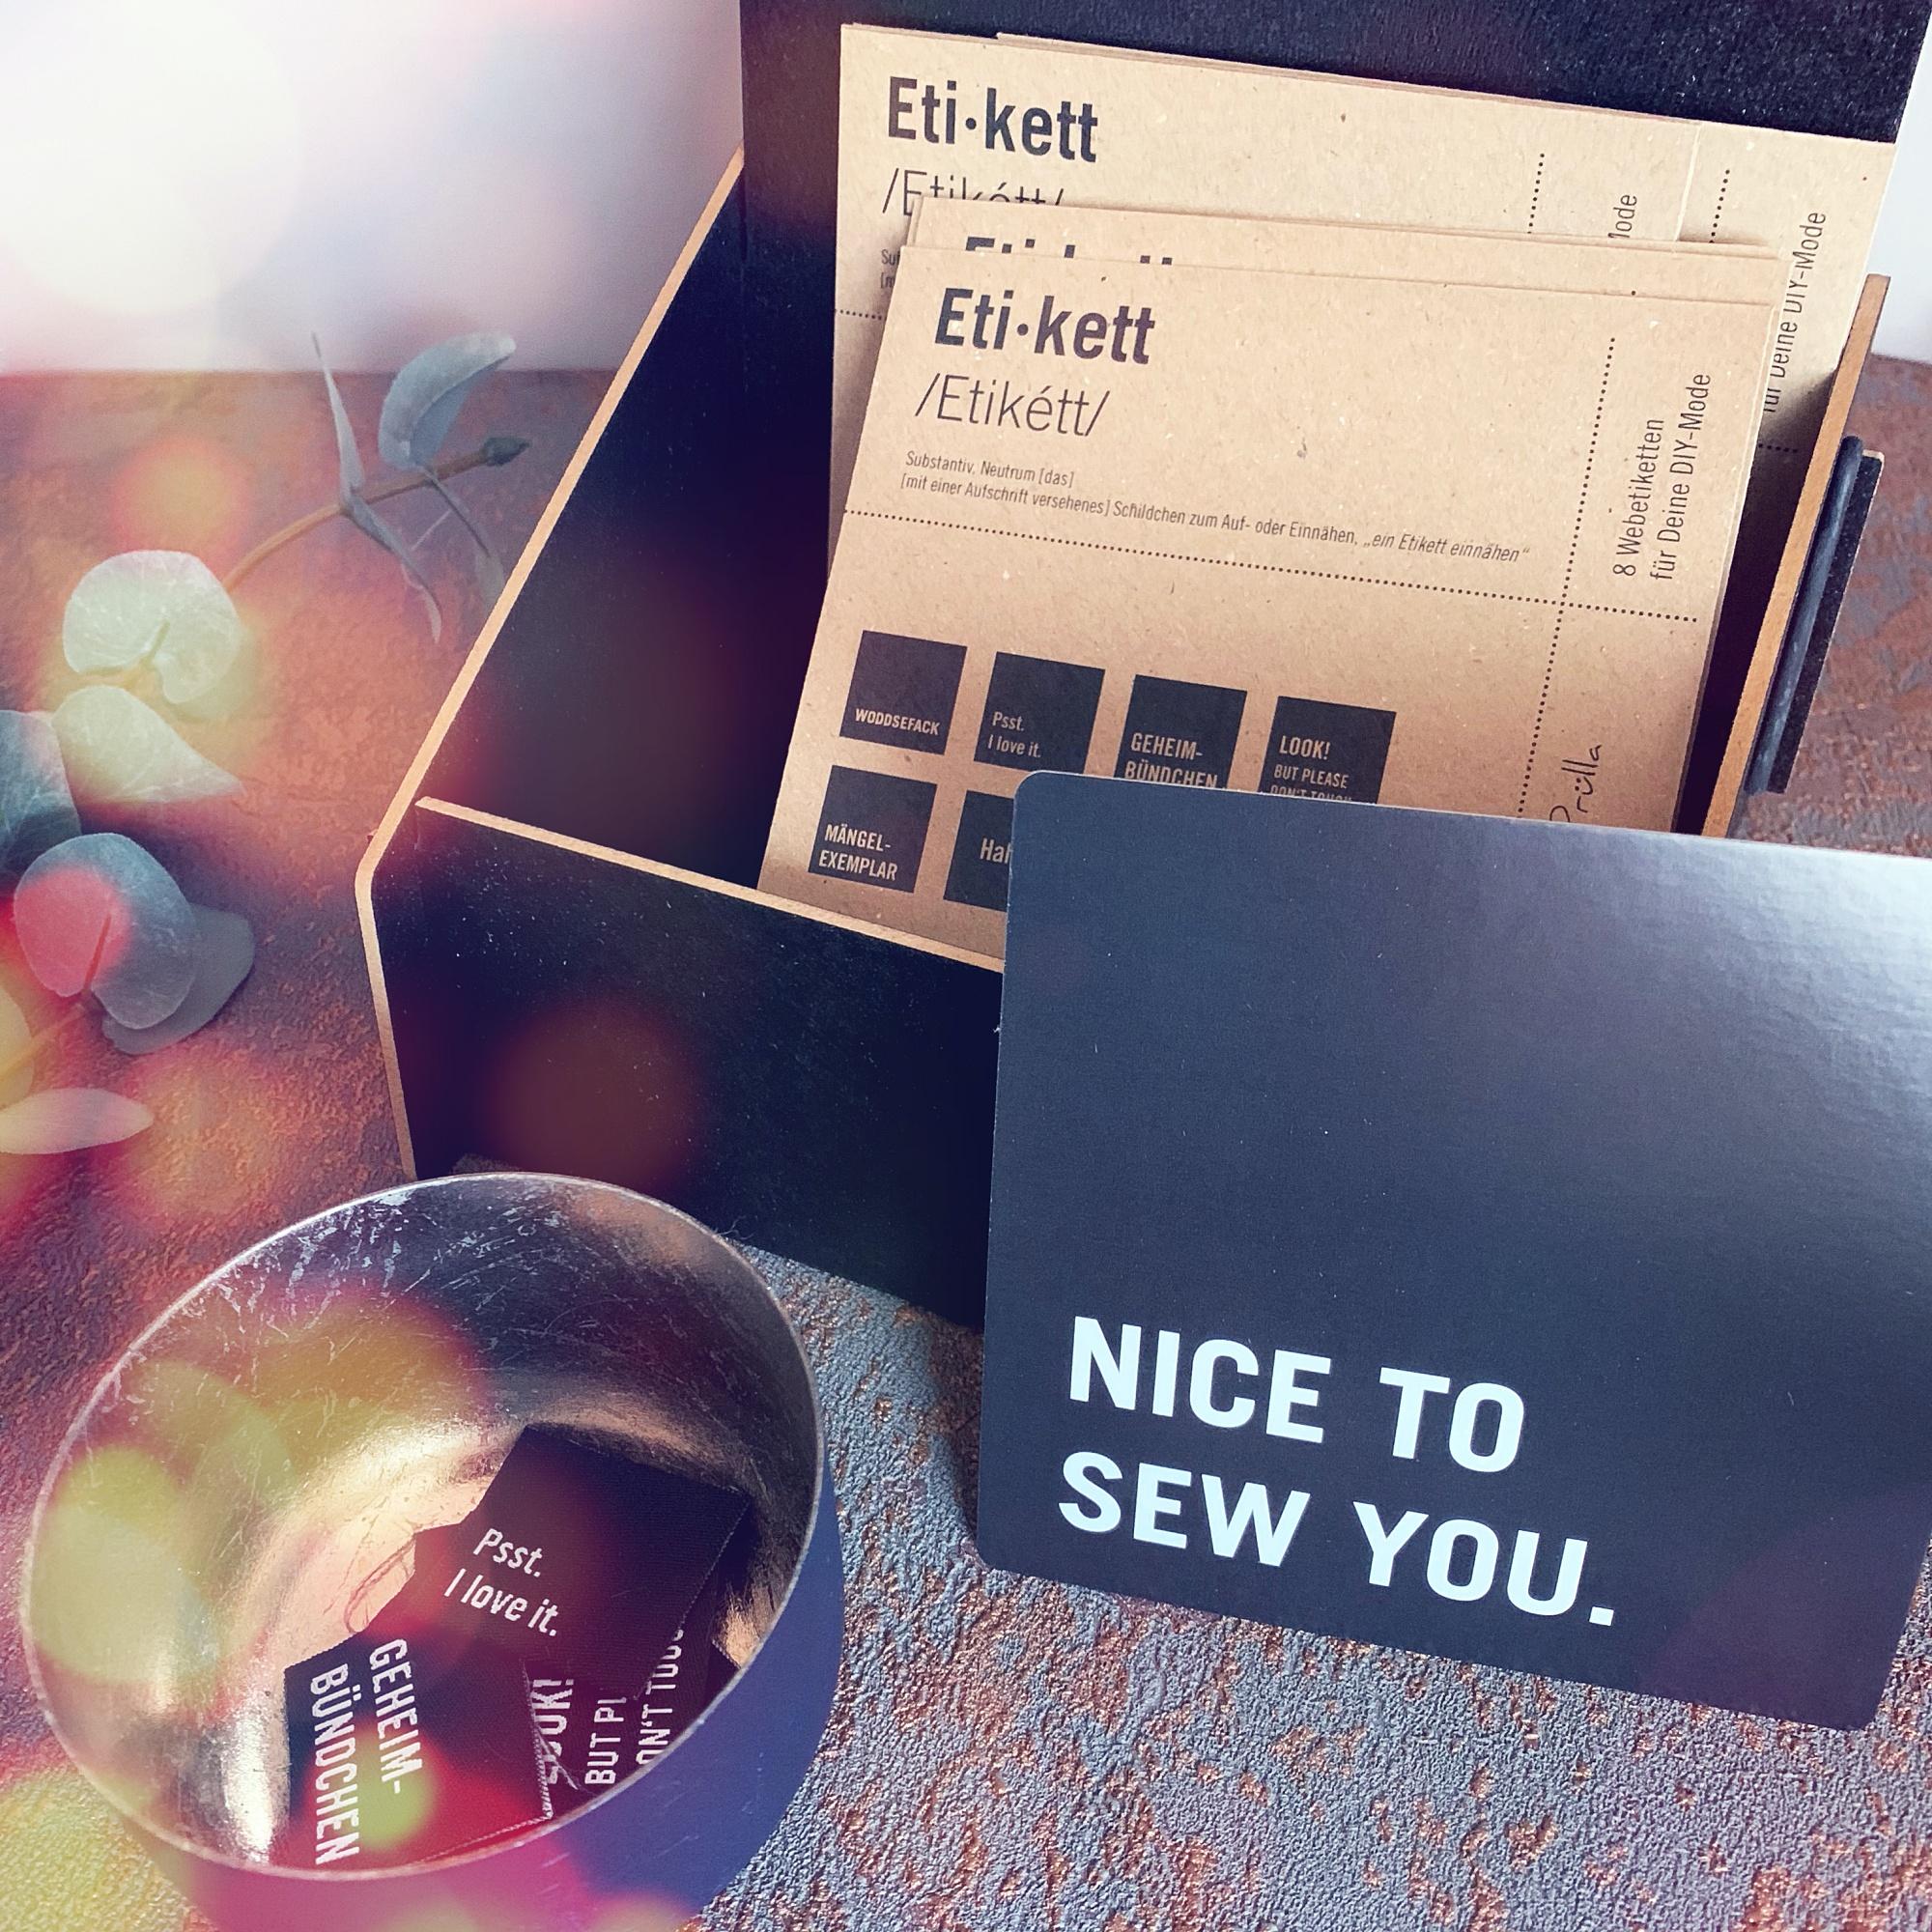 #mehretikette Vol.1 Nice to sew you